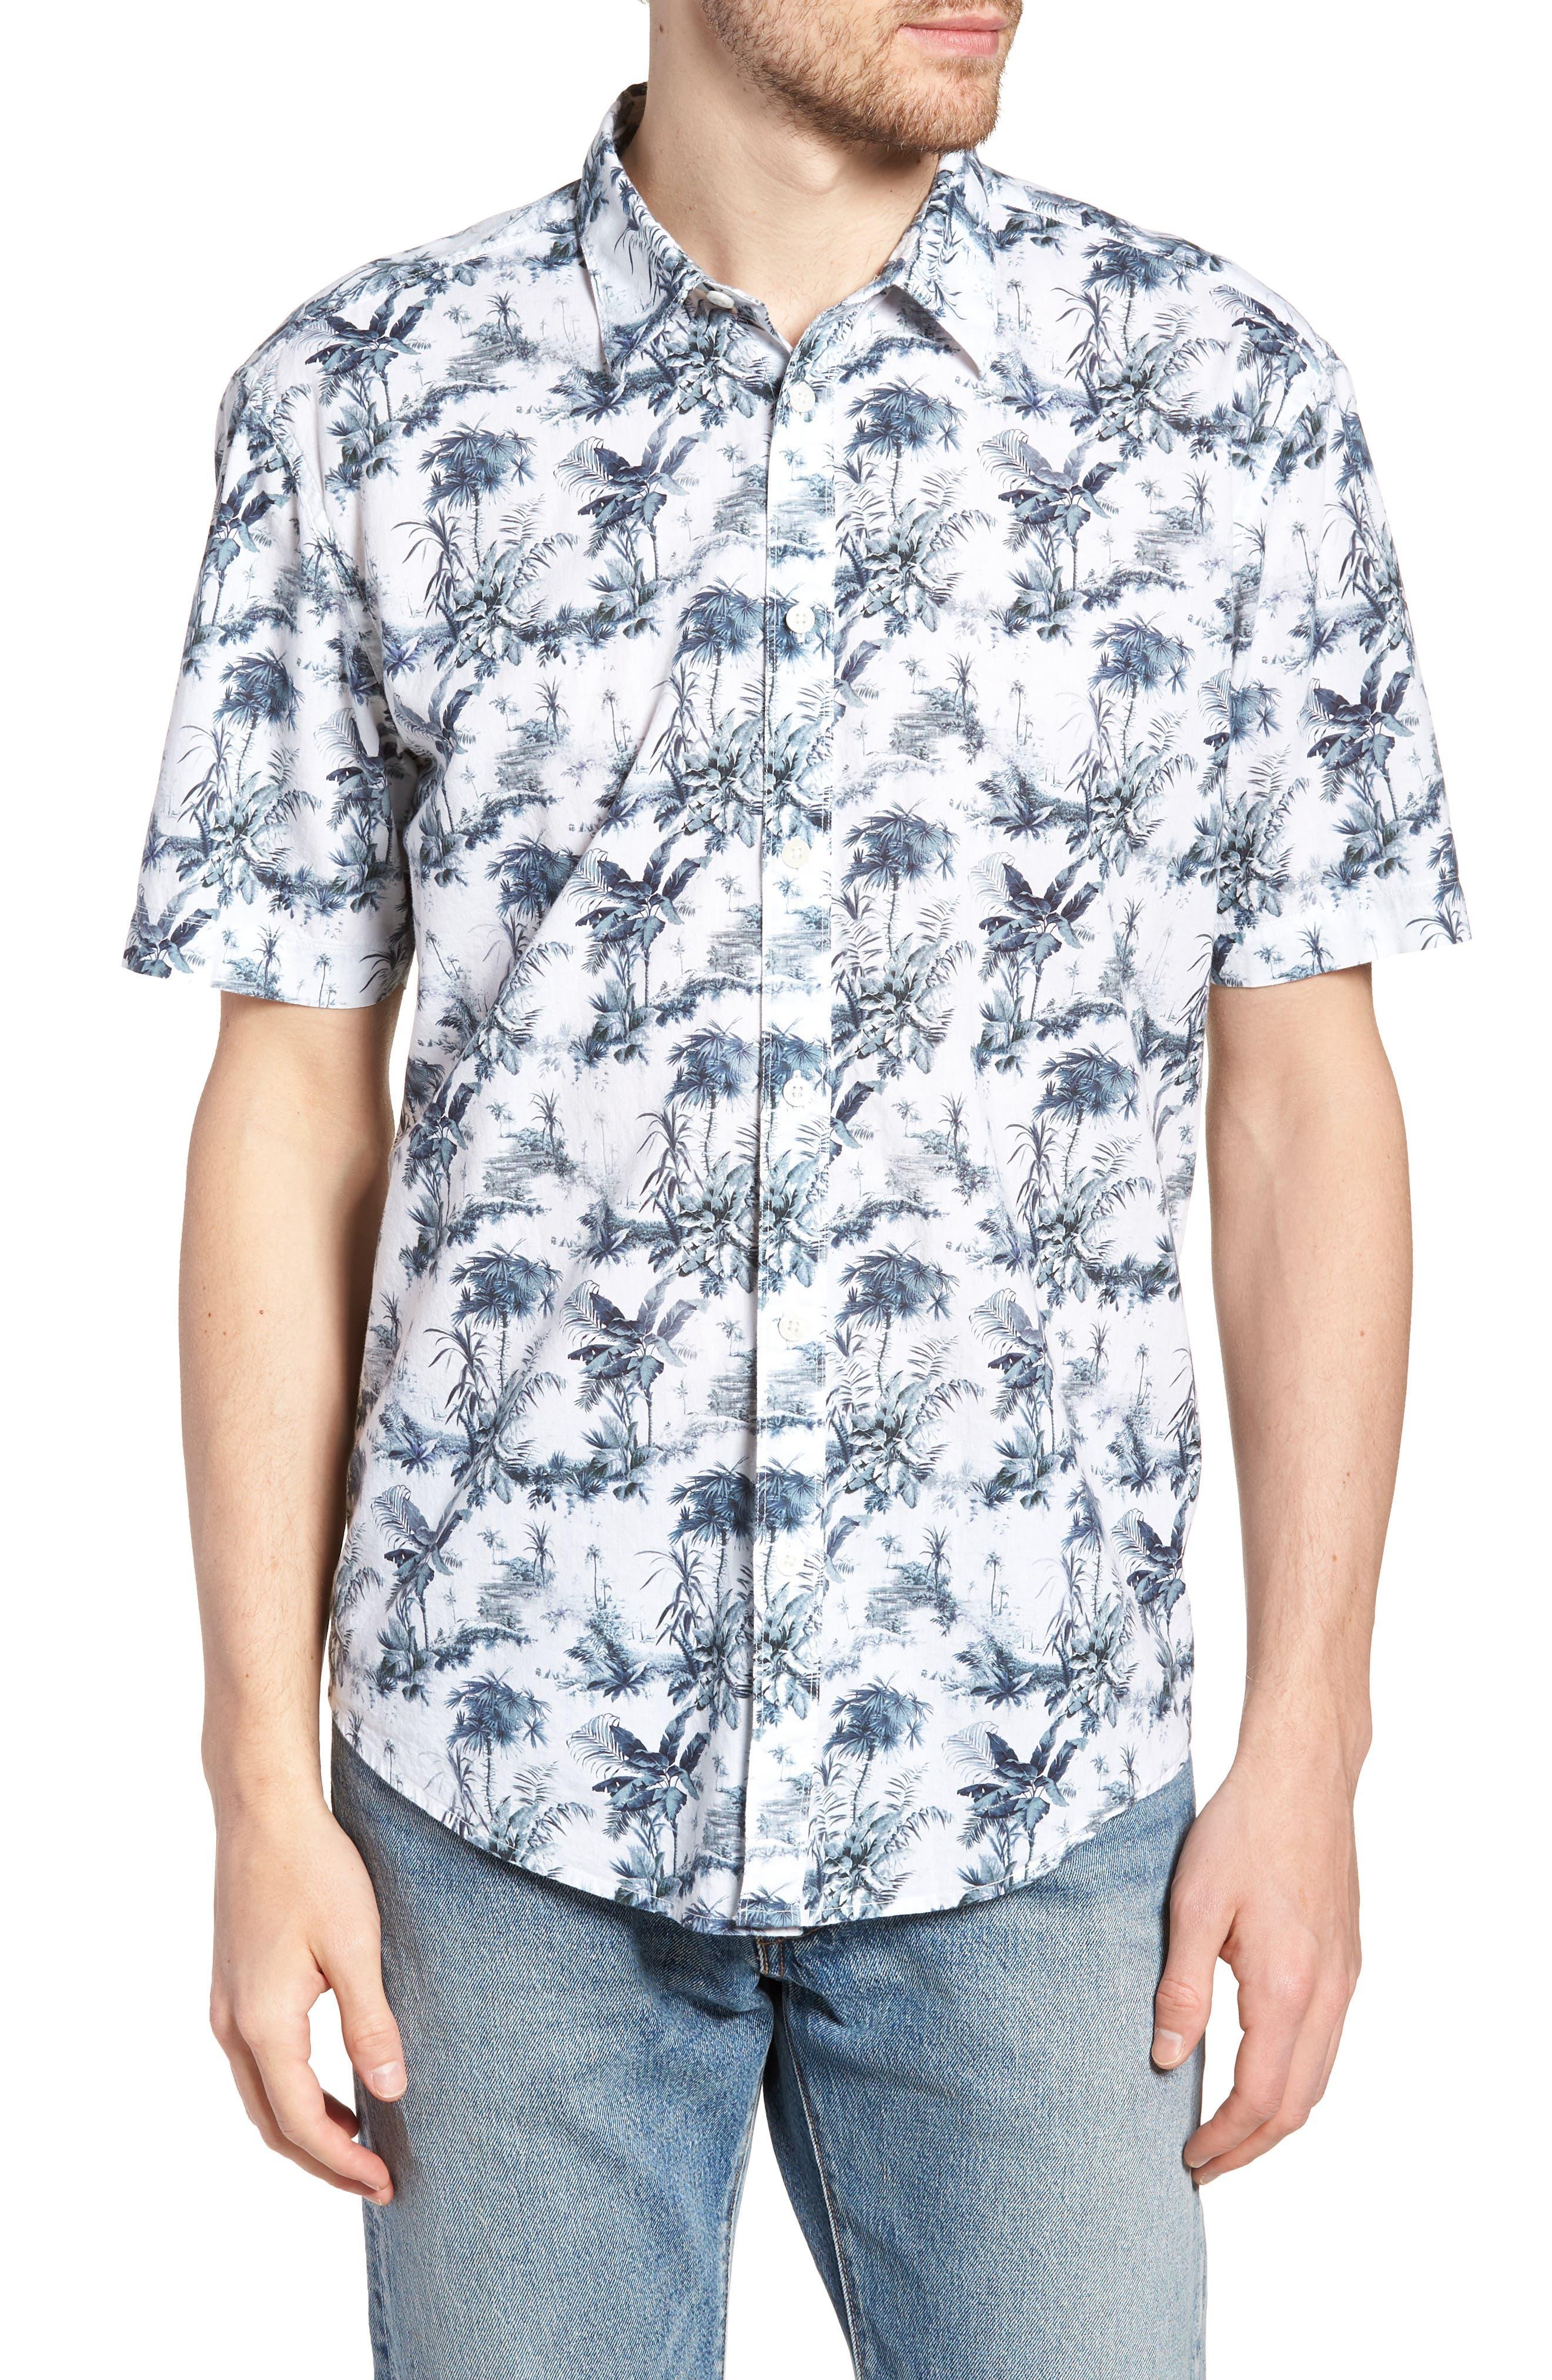 Waiki Regular Fit Short Sleeve Sport Shirt,                         Main,                         color, White